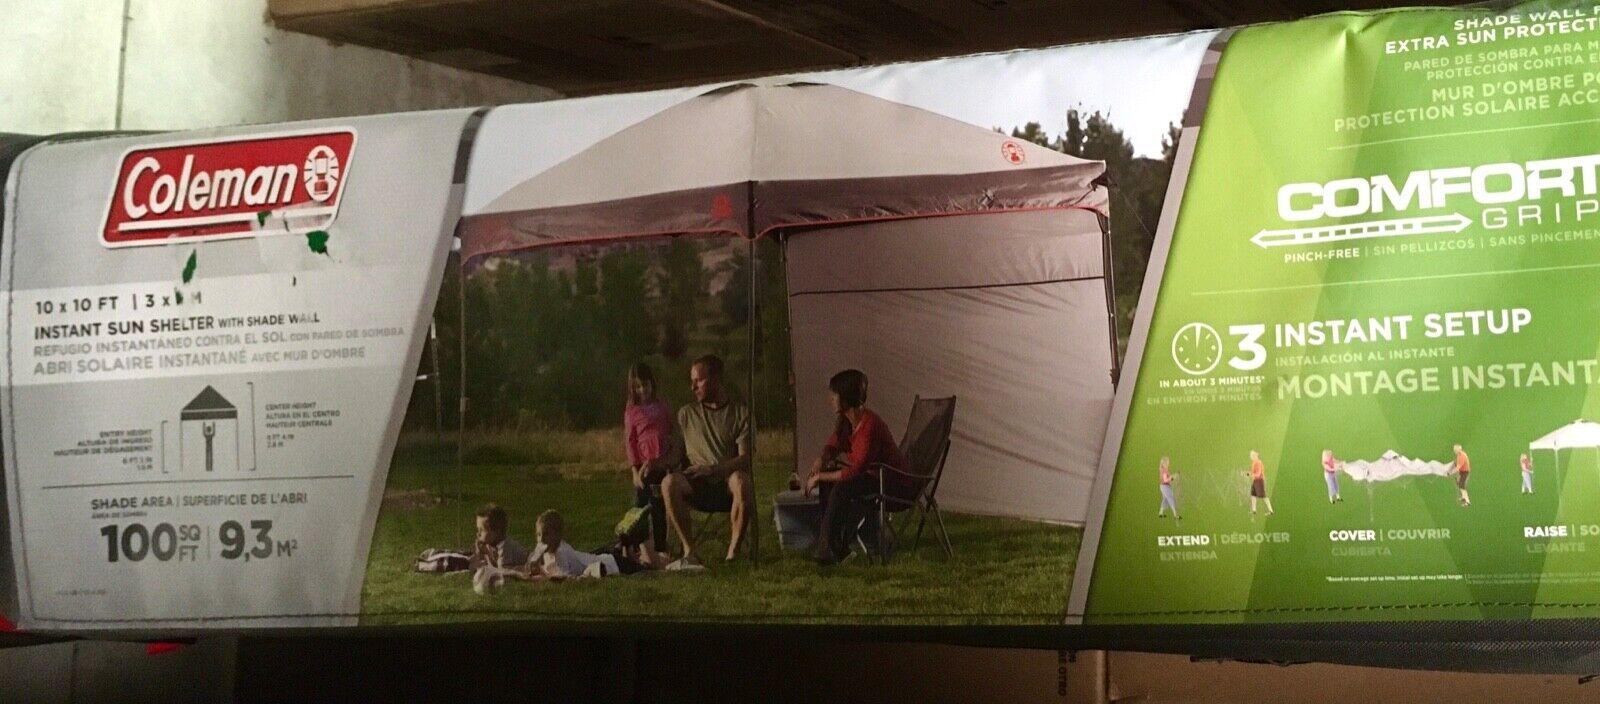 Coleman Screened auvent tente avec instantanée SetupBACK HOME Screenhouse ensembles...